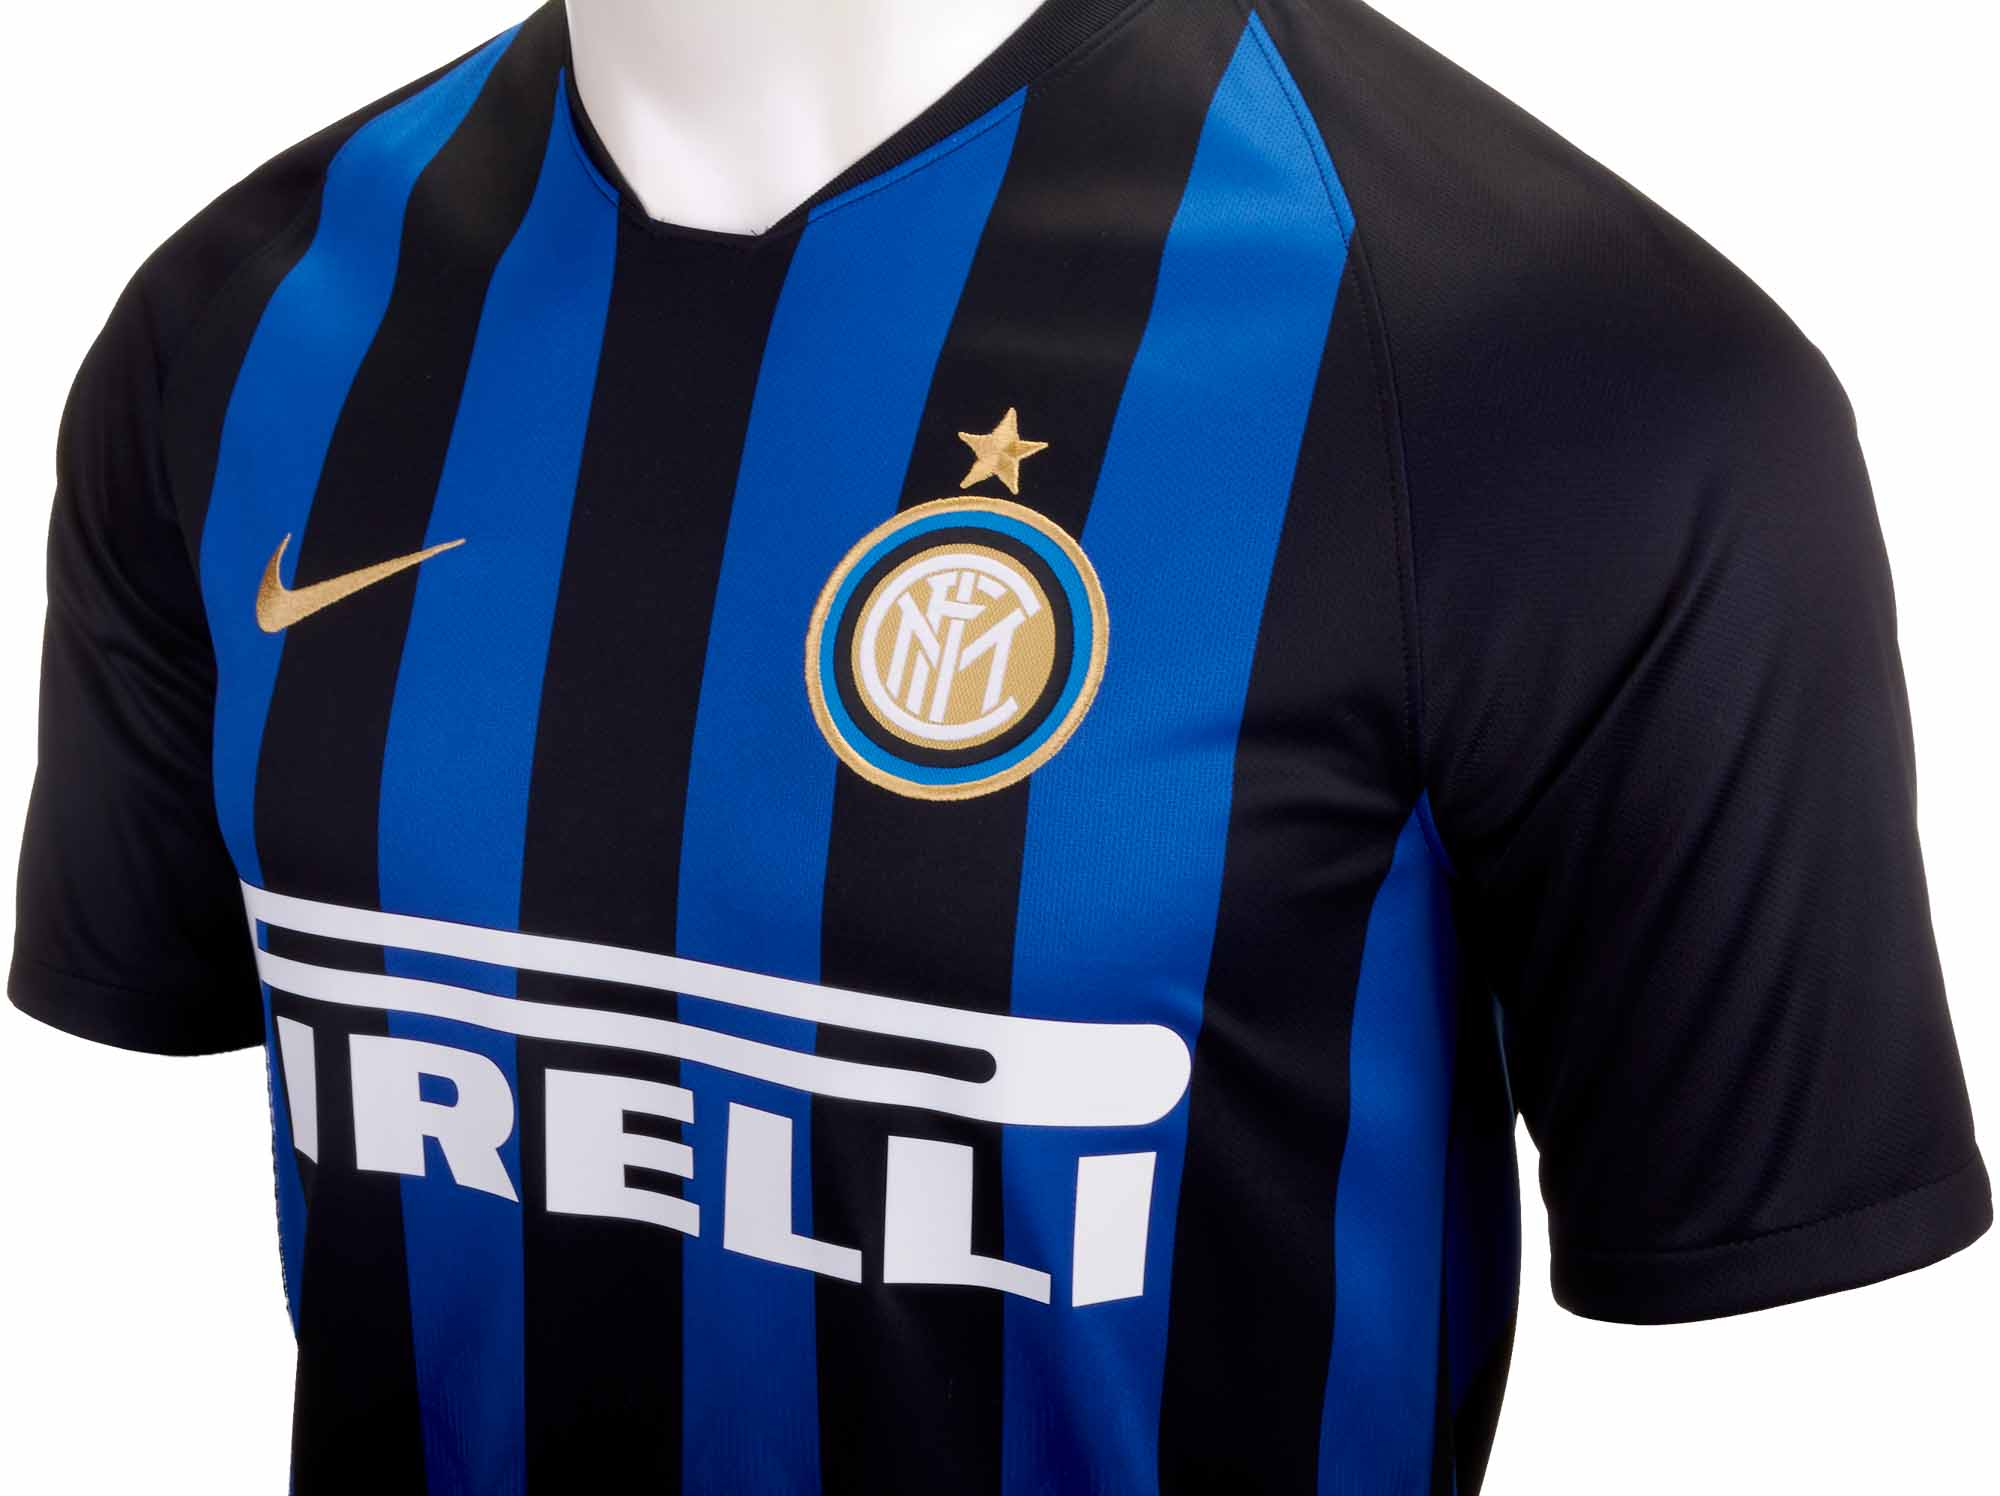 newest 953dd 7e514 Nike Inter Milan Home Jersey 2018-19 - SoccerPro